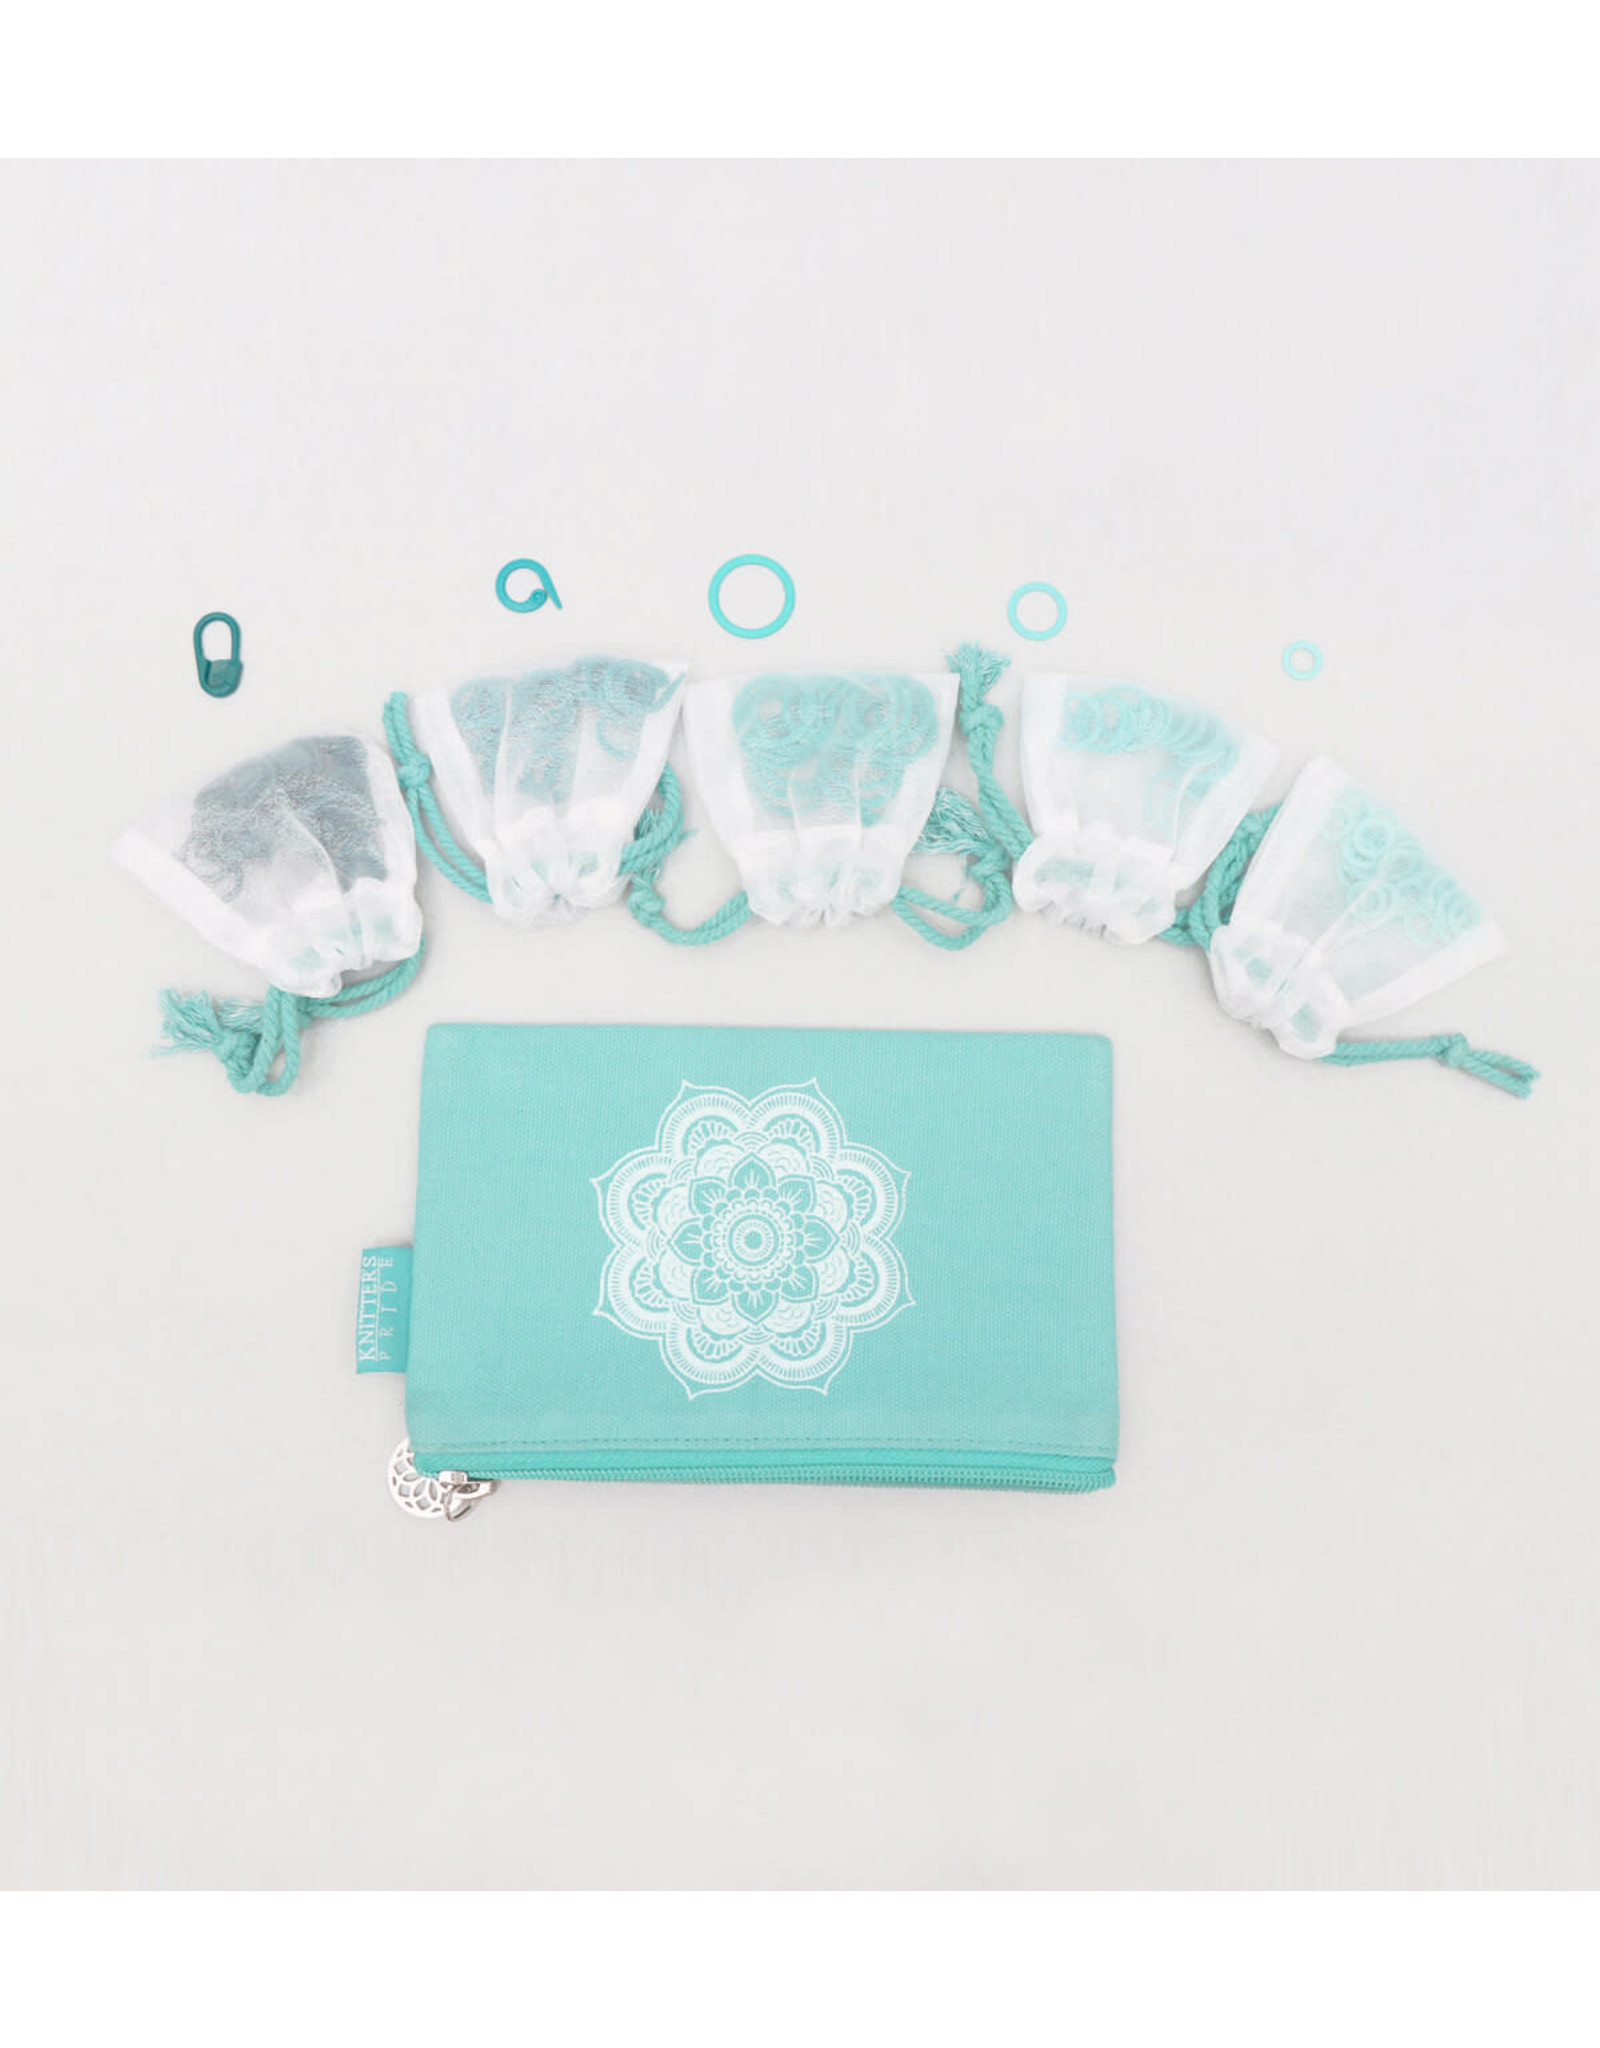 Knitter's Pride Mindful markers/bag